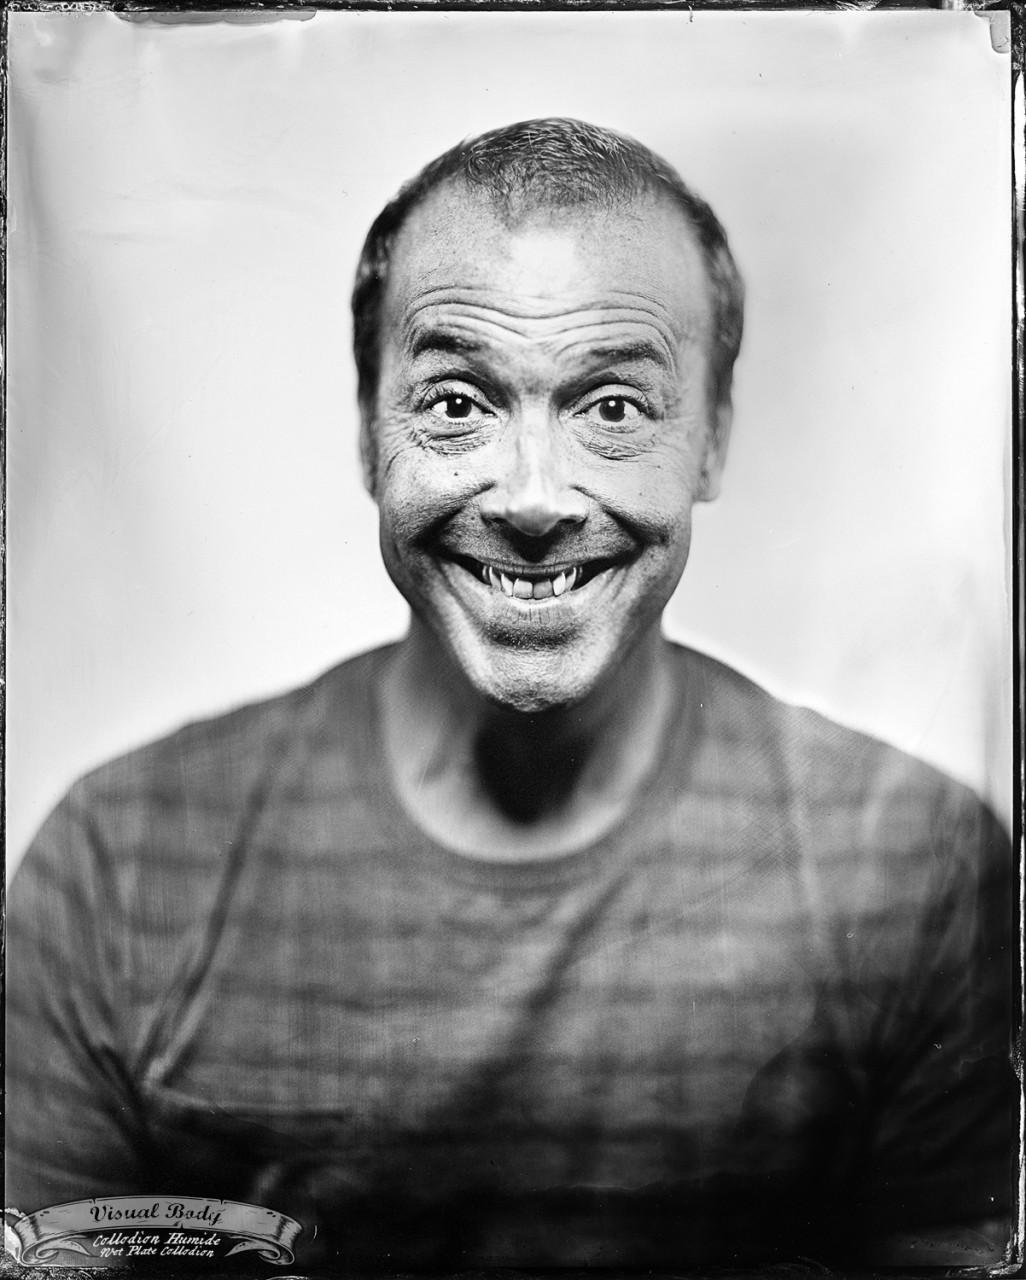 Pierre Brassard. Profession: humoriste/comedian.